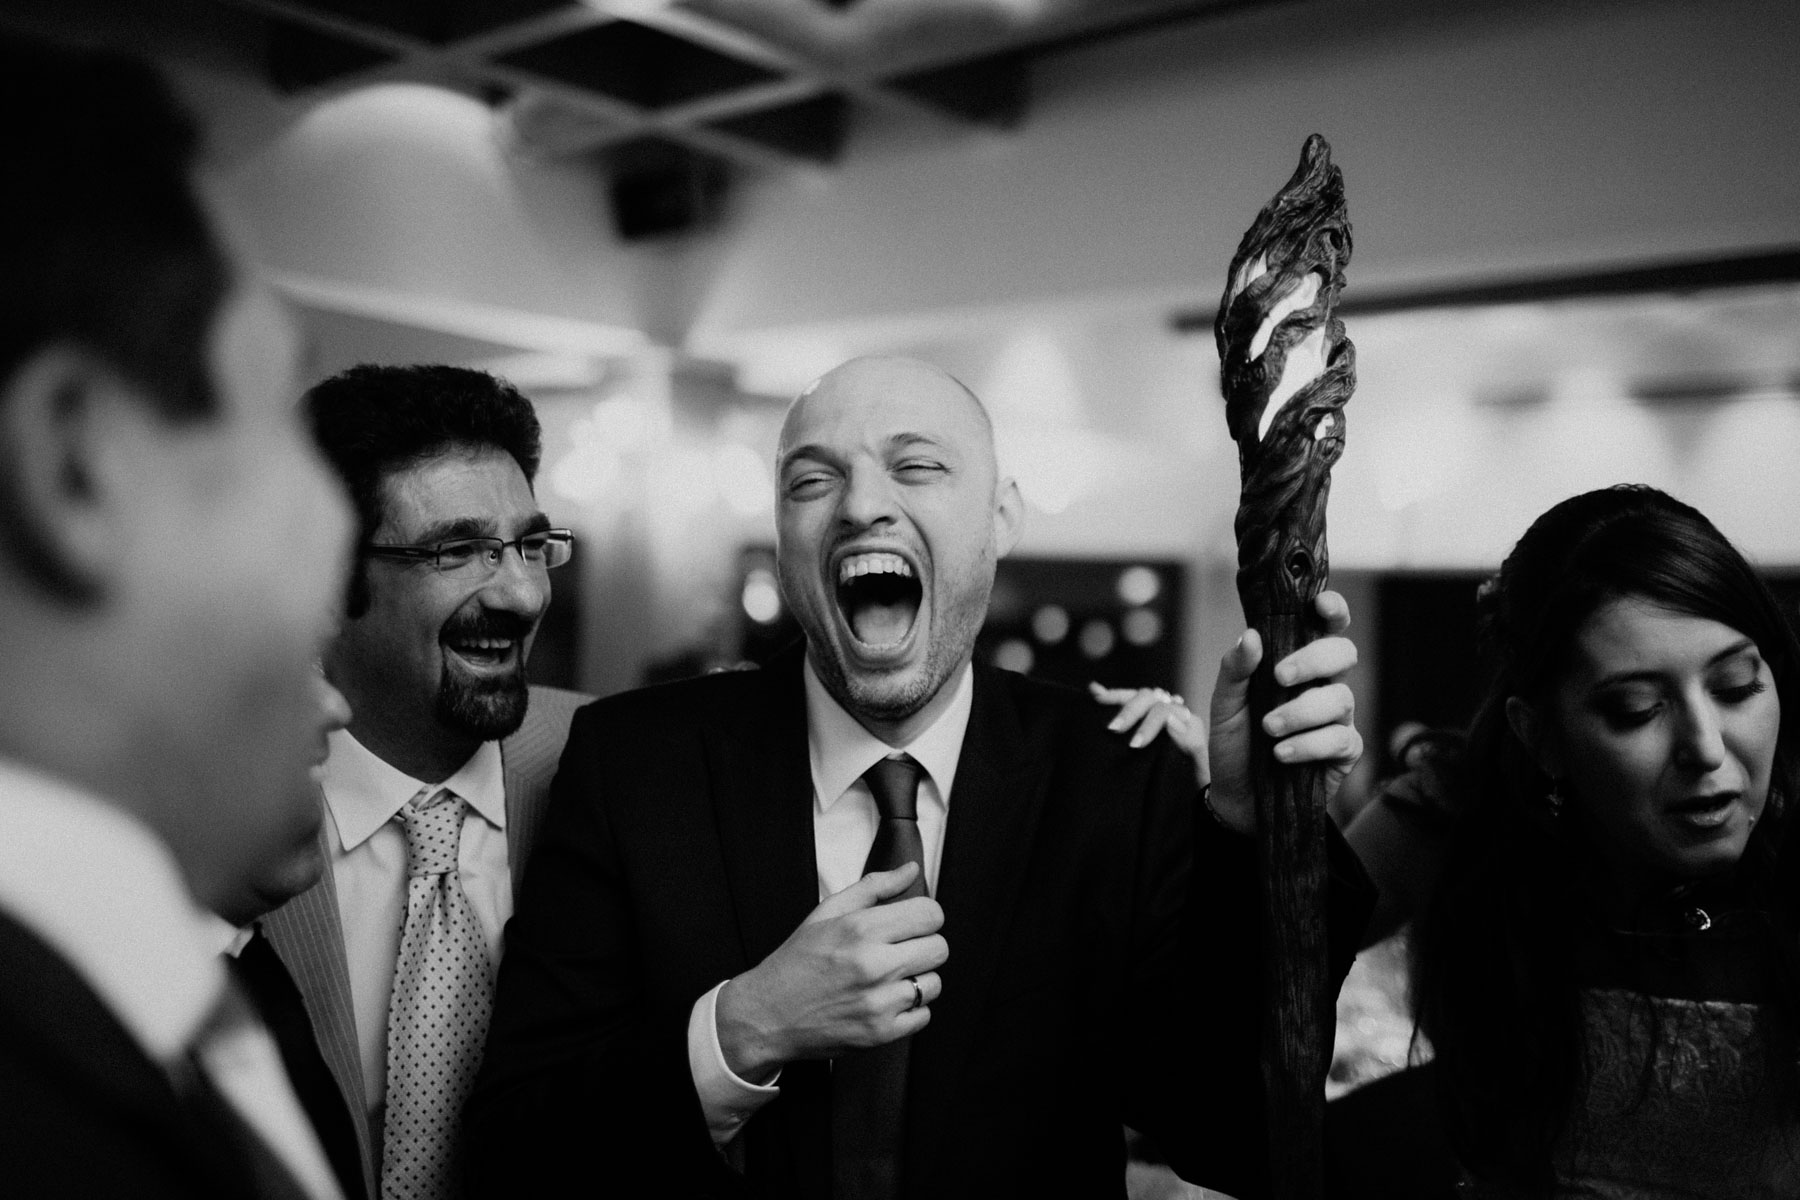 fotografo de bodas Jairo Crena-154